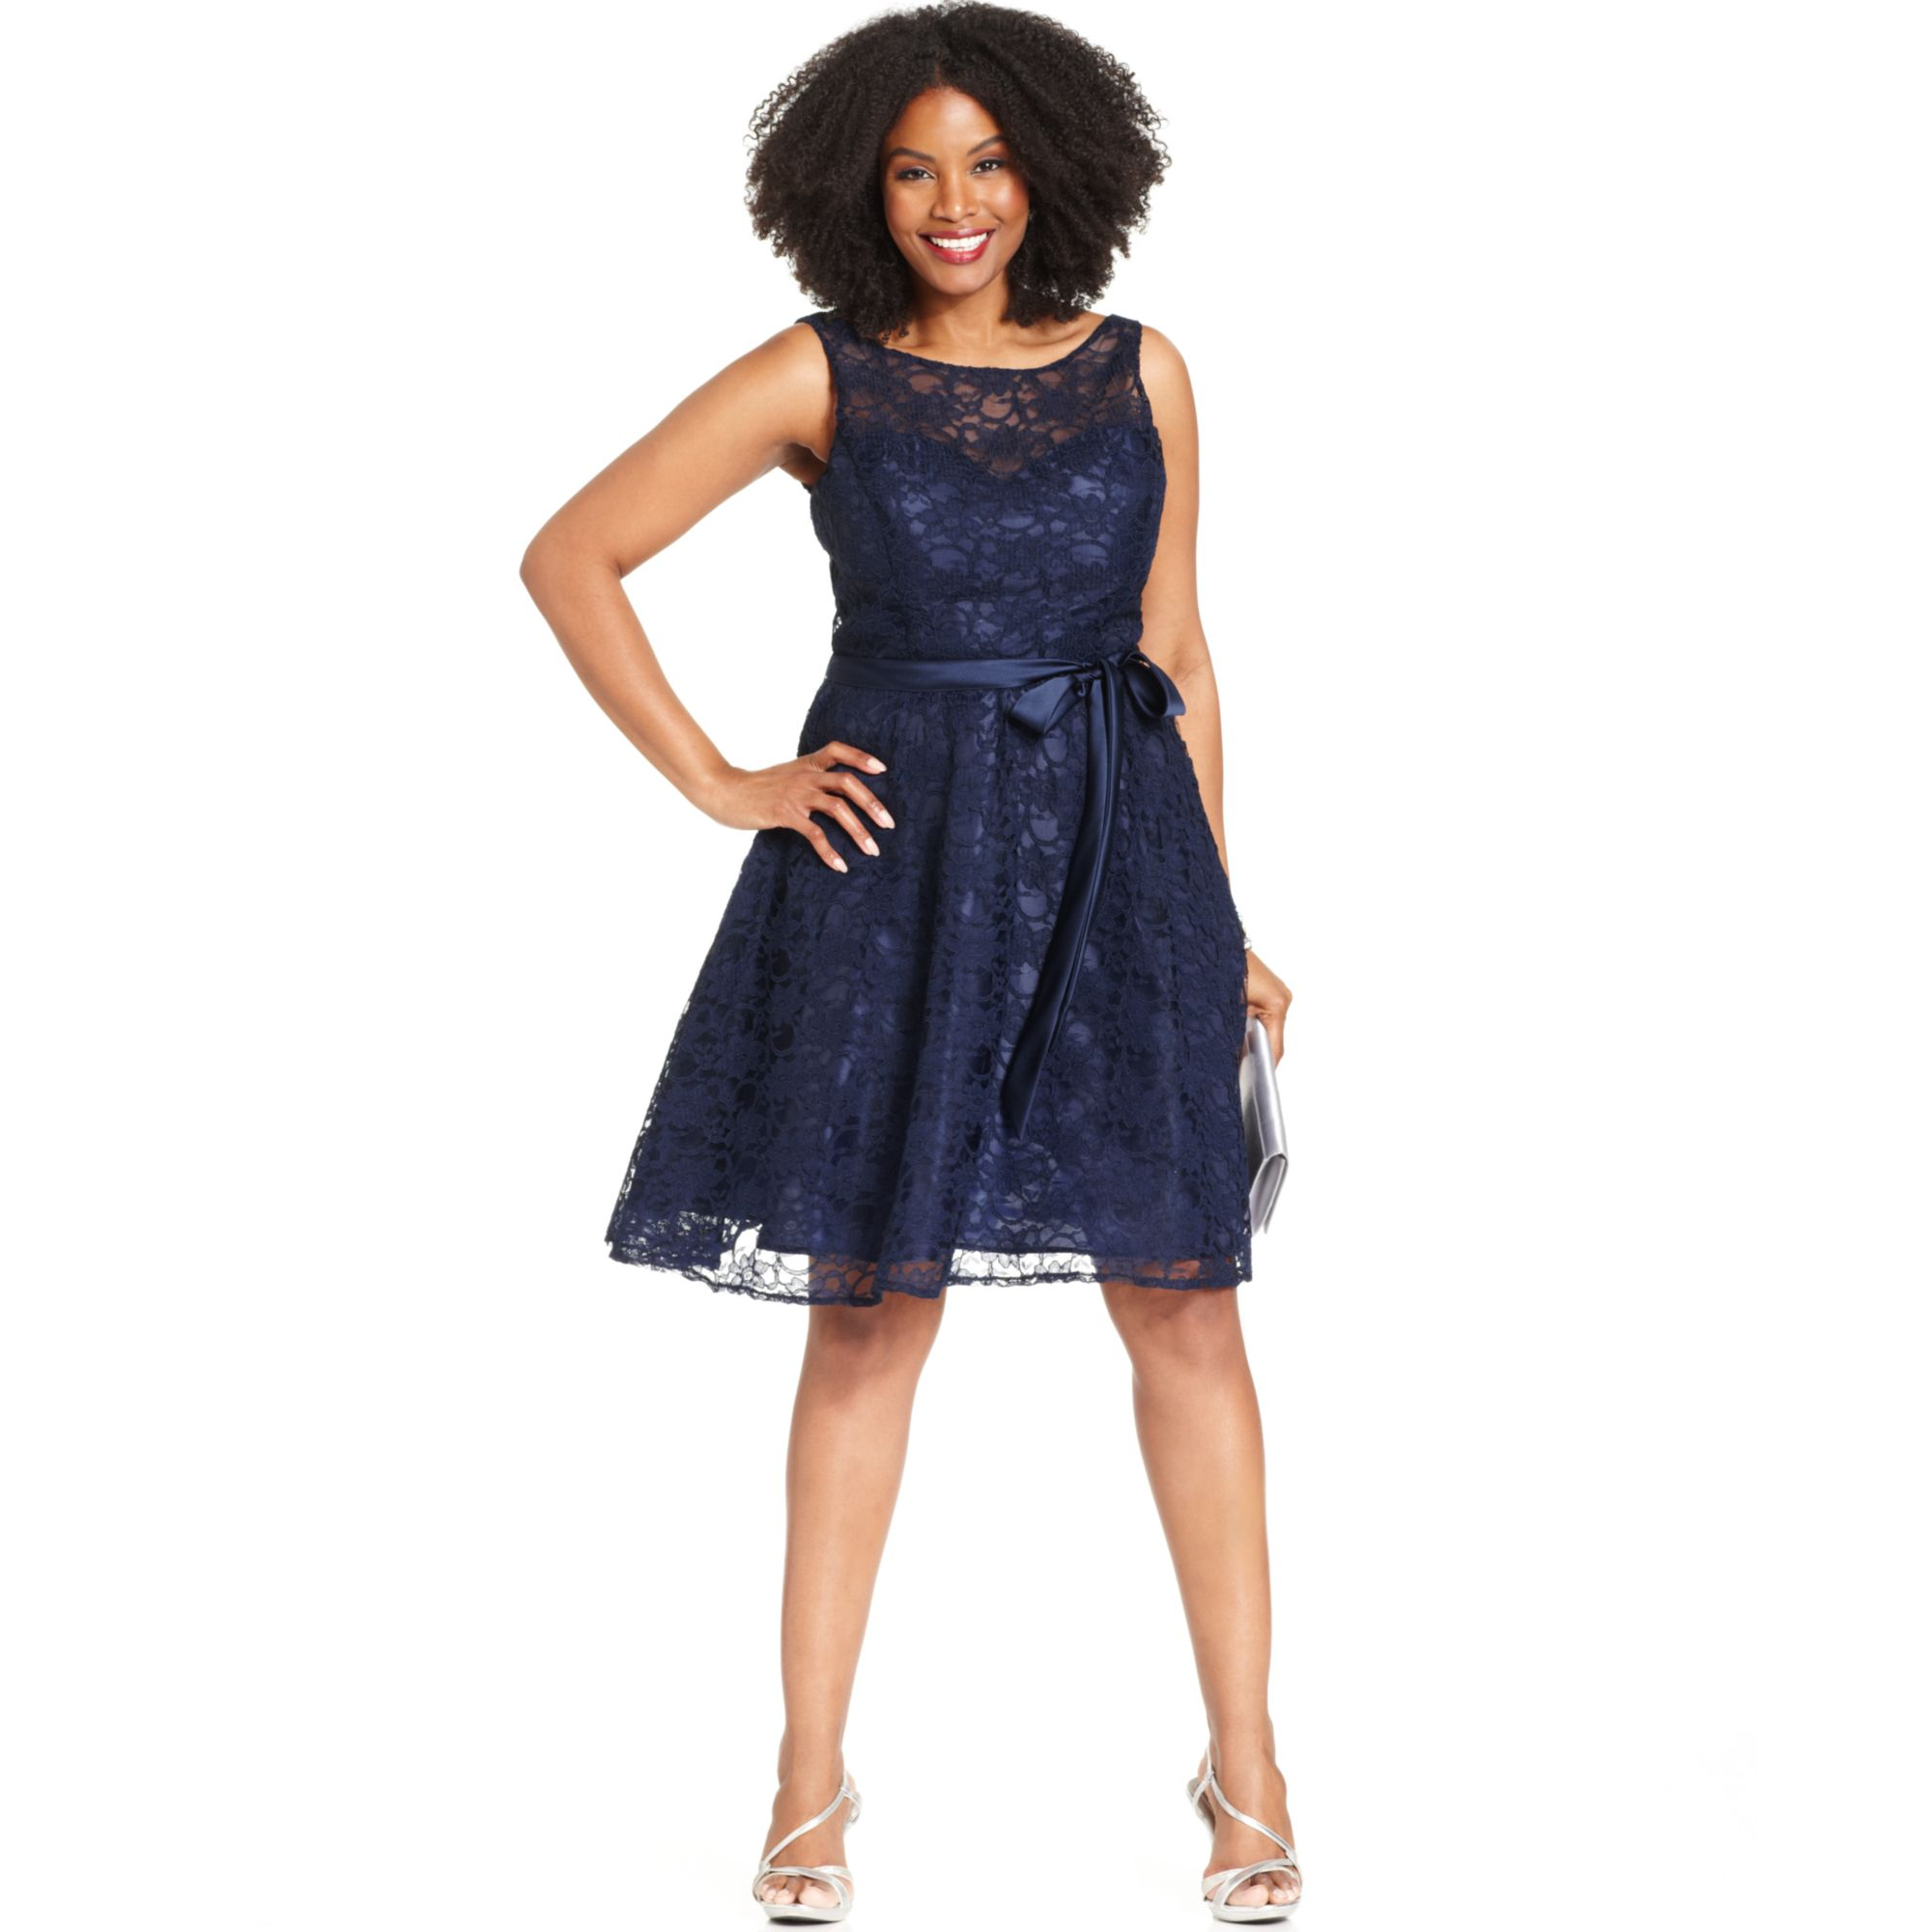 Marina Blue Plus Size Illusion Lace Dress